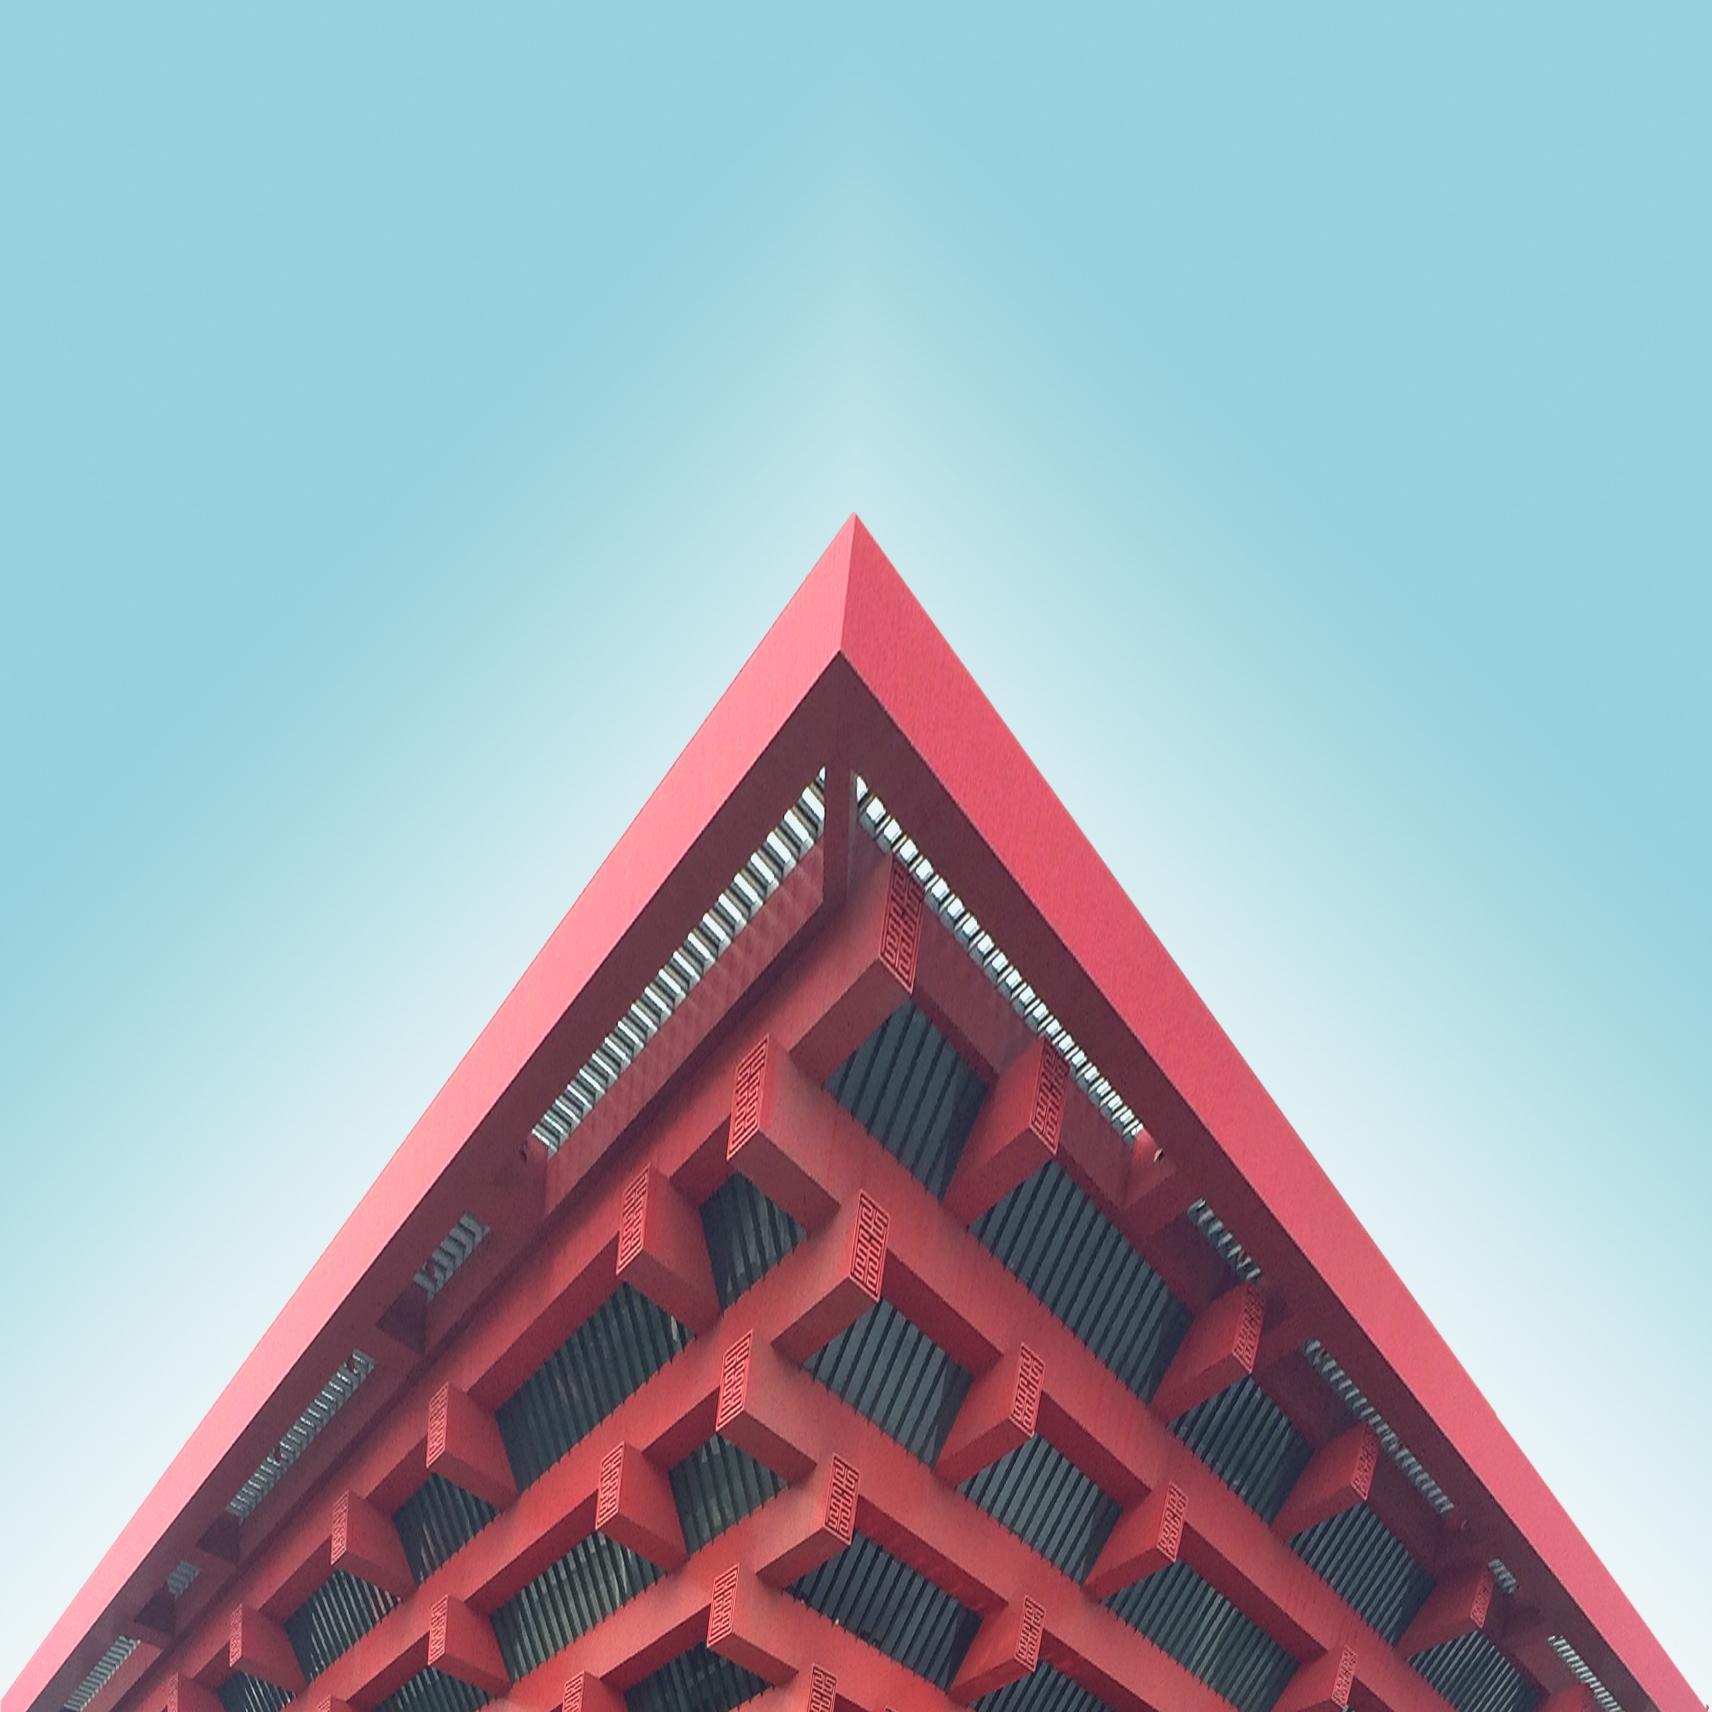 Architecture Photography: Beaut - benim_jbweb | ello